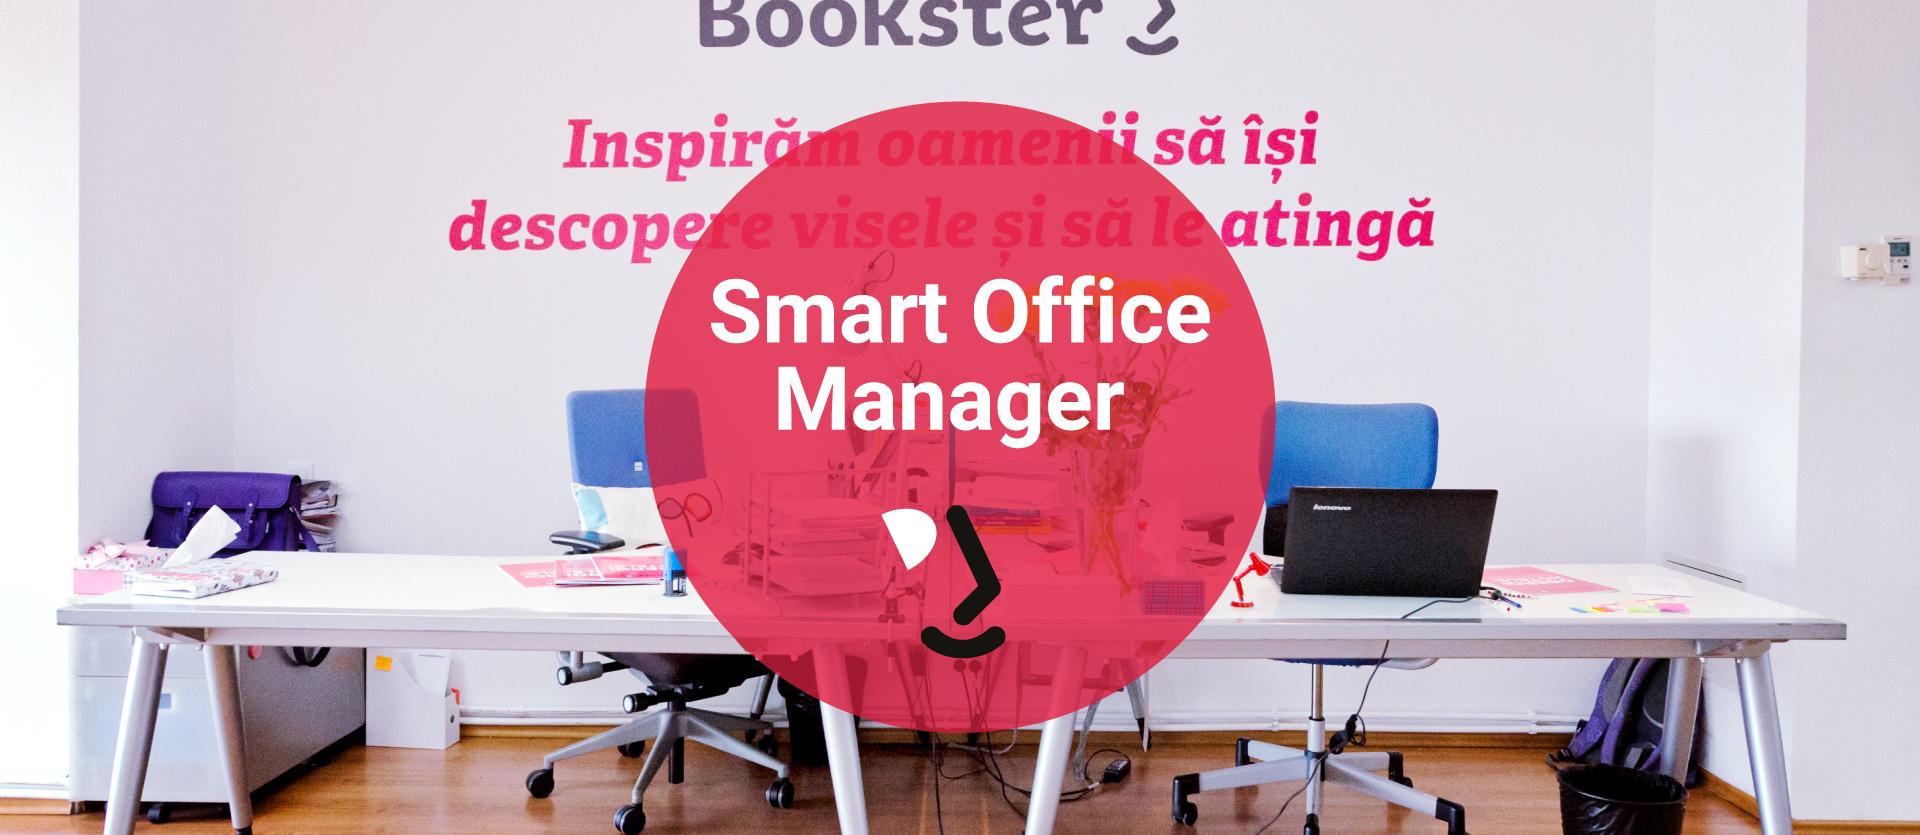 Smart Office Manager Best Jobs